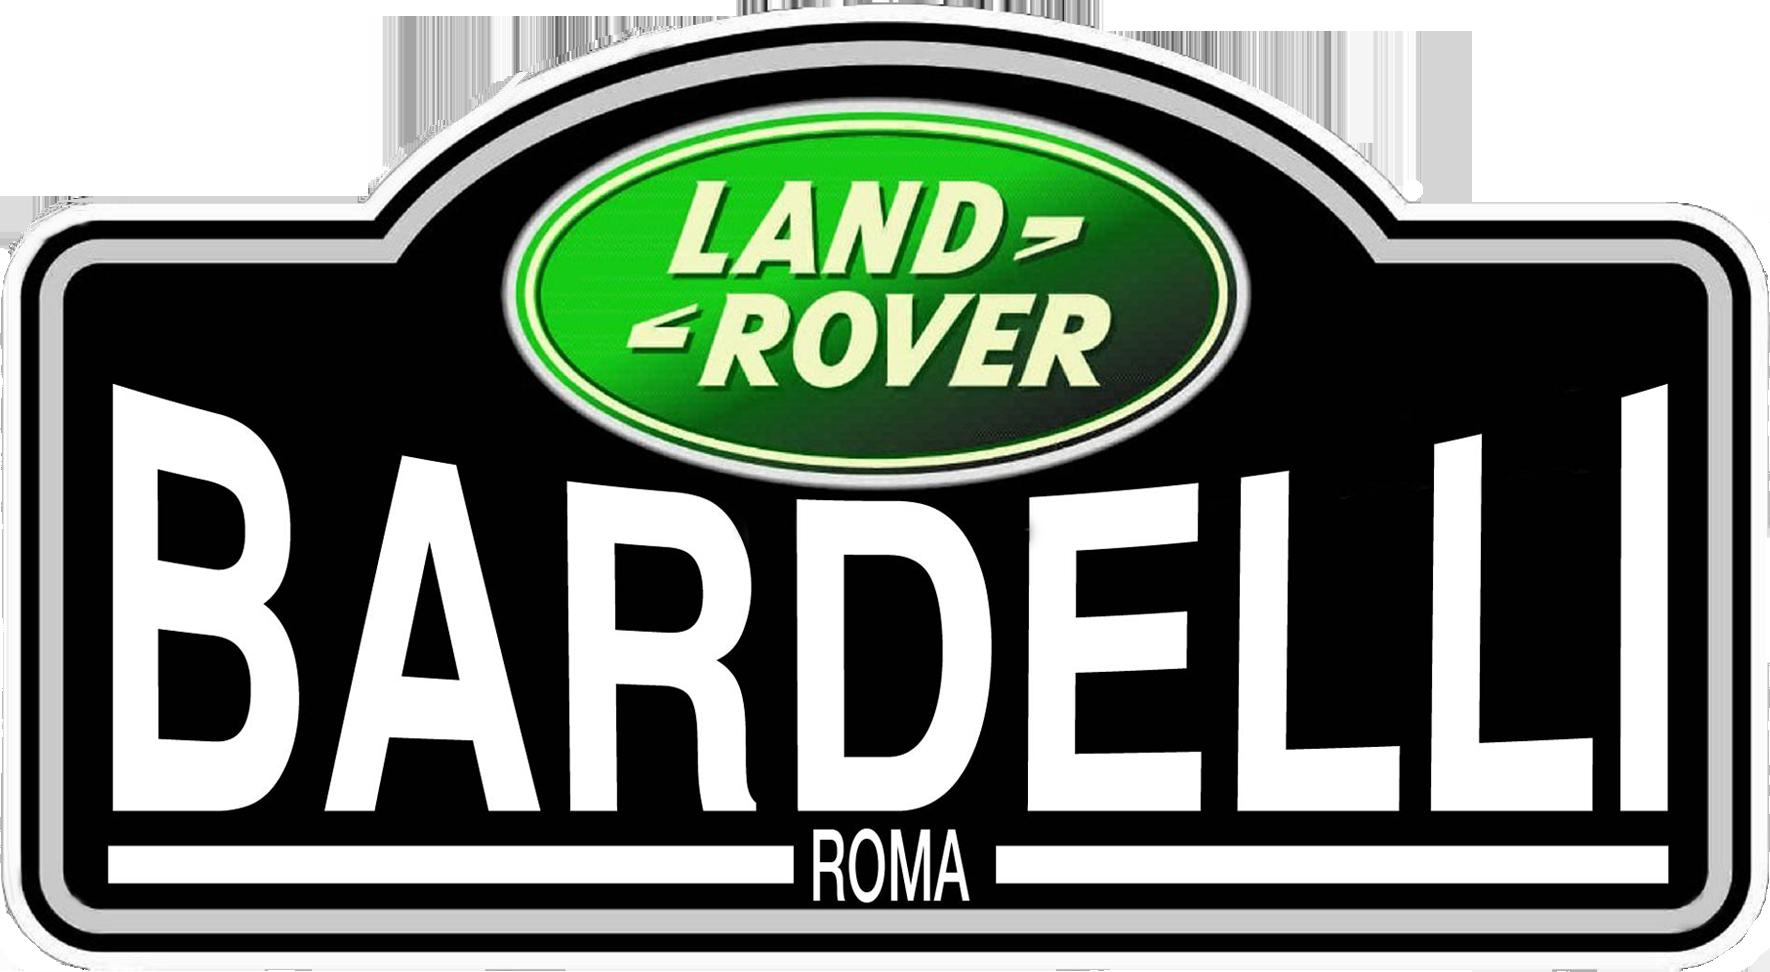 Jaguar land rover logo png - photo#22